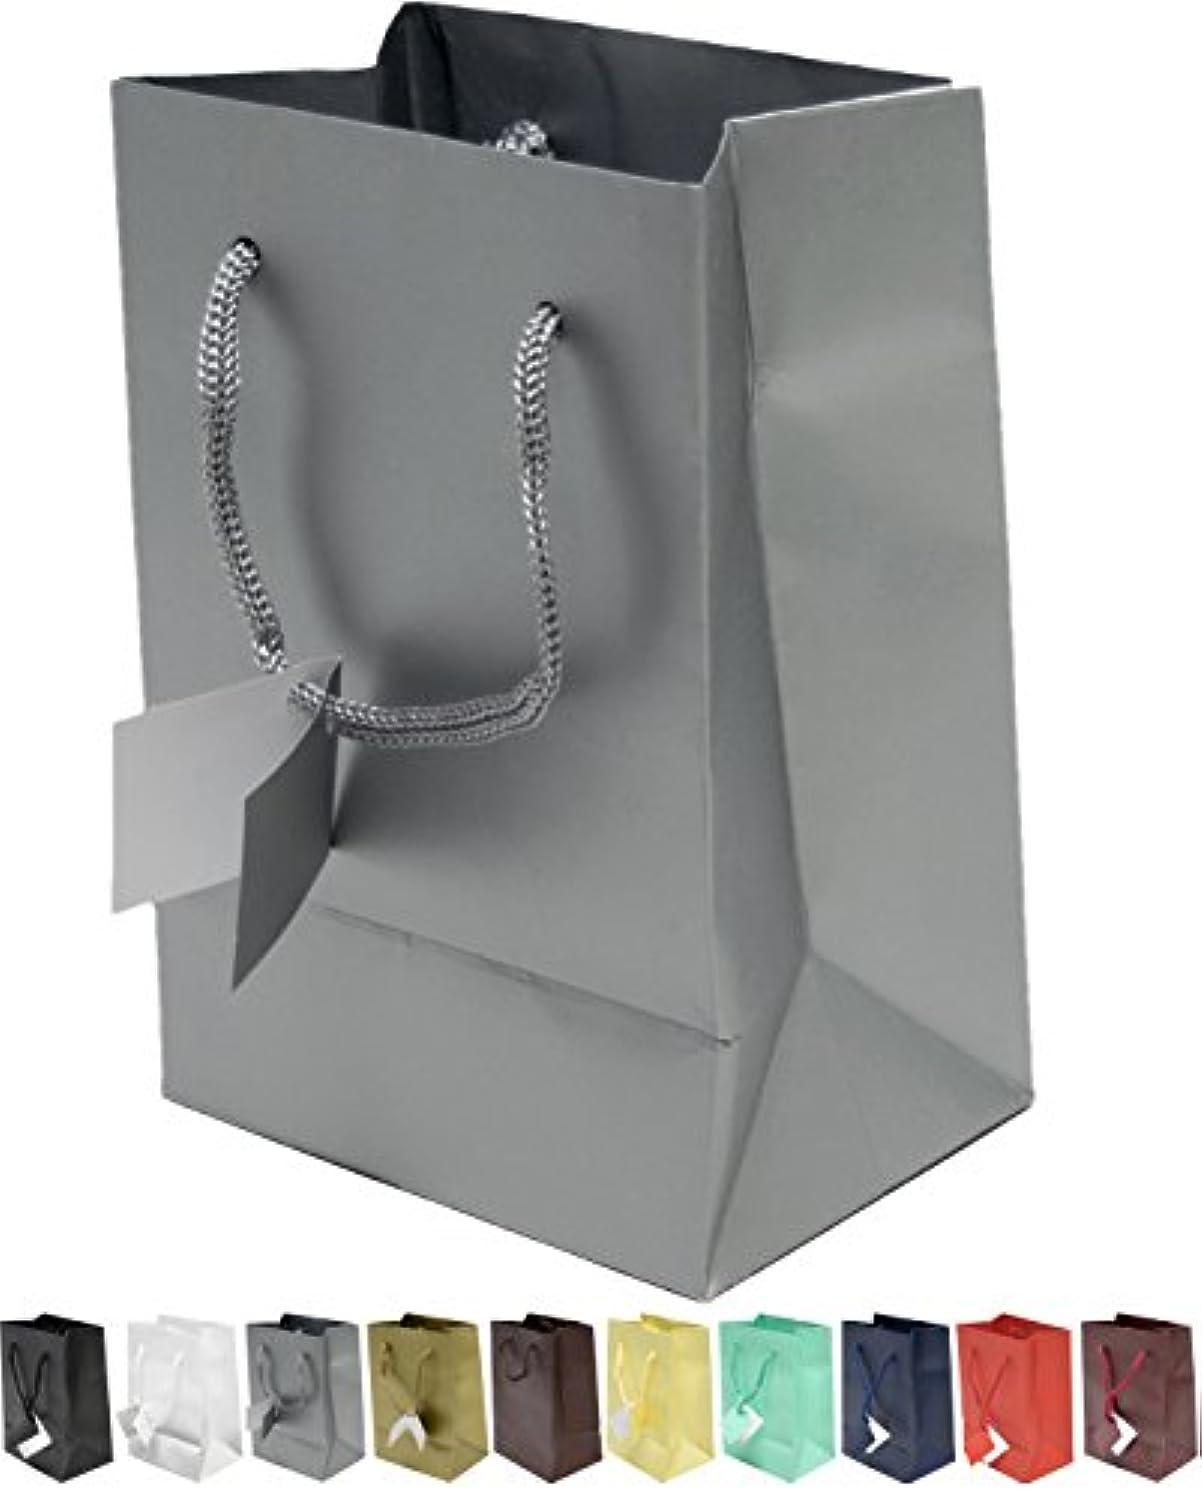 Novel Box? Silver Matte Laminated Euro Tote Paper Gift Bag Bundle 4.75